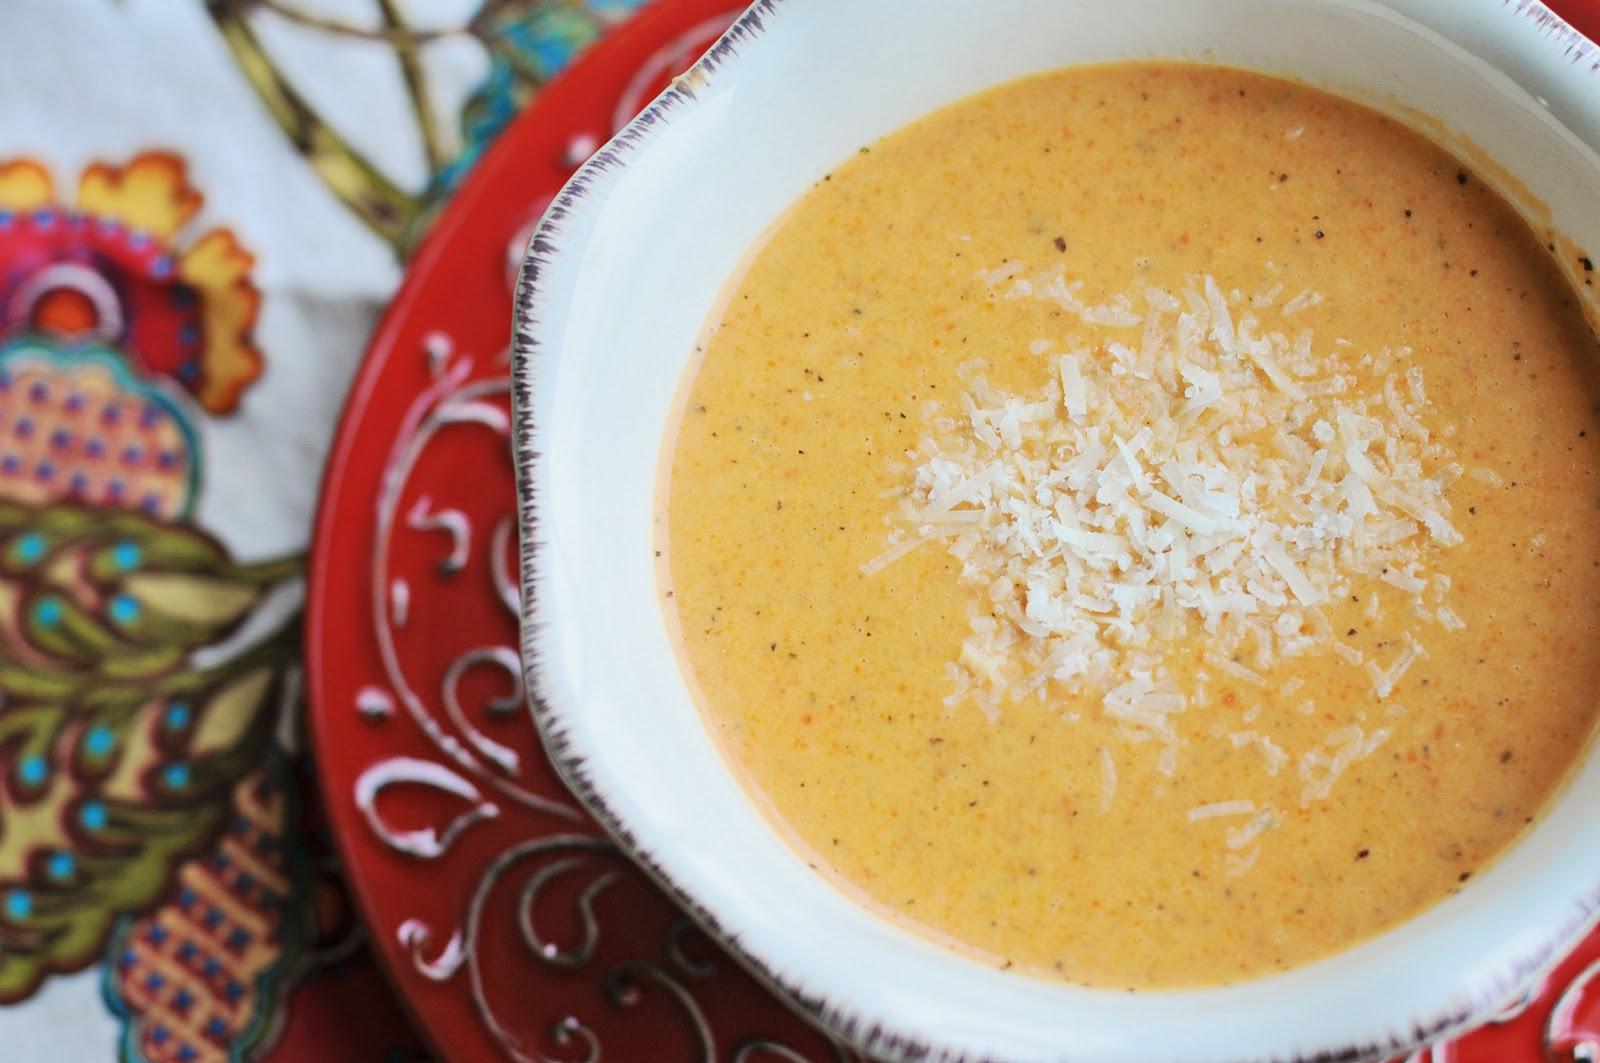 Barefoot and Baking: Tomato-Basil Parmesan Soup